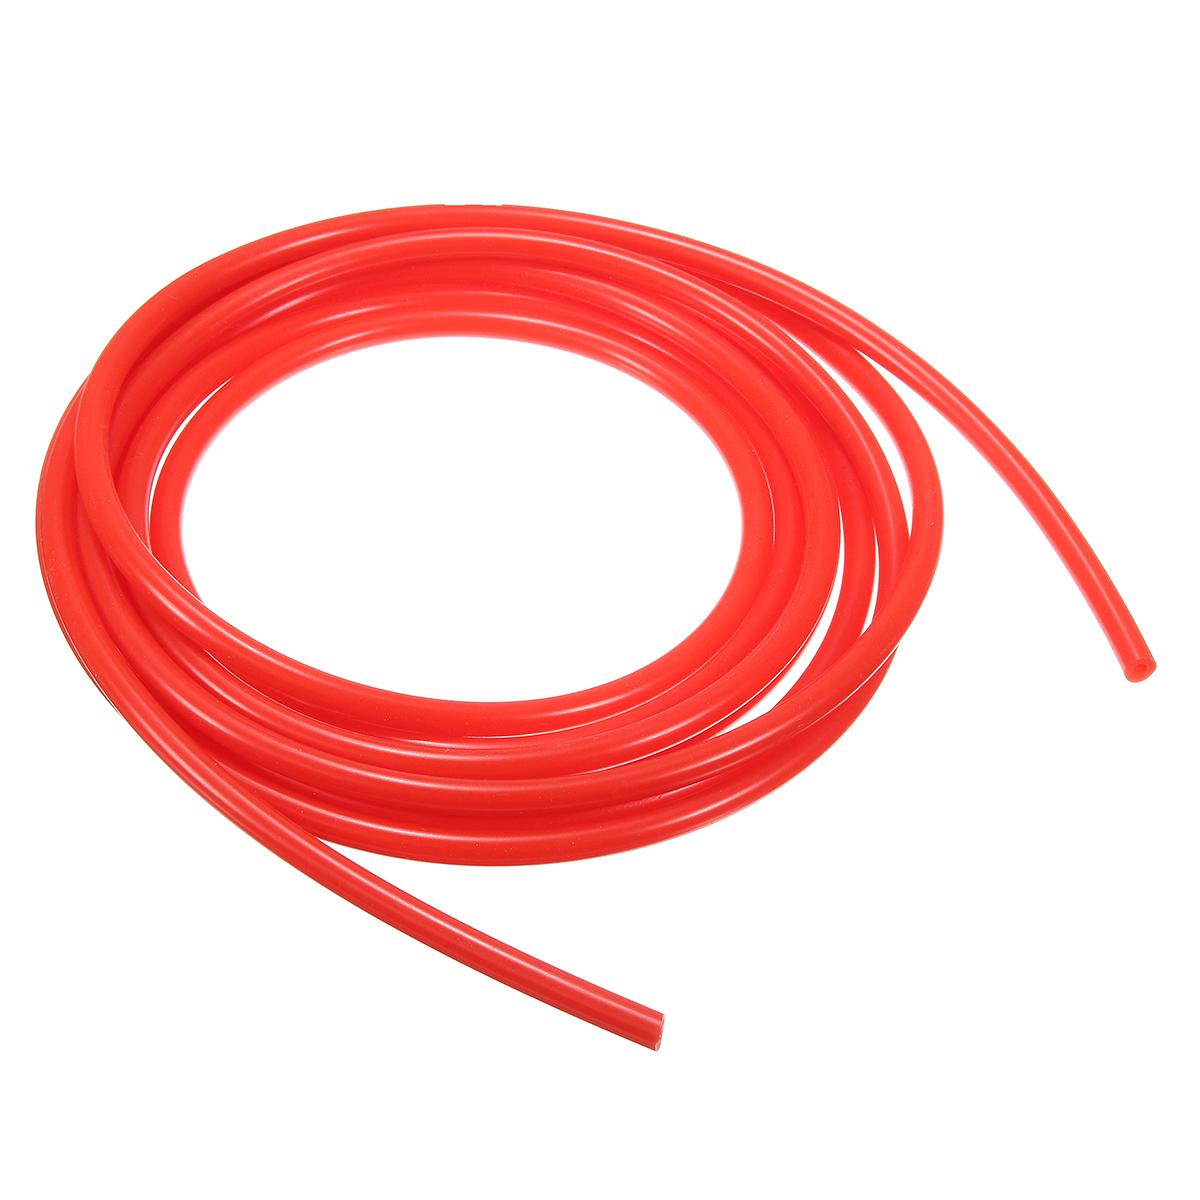 3mm 4 Meter Silicone Vacuum Hose Tube Tubing Line Pipe 13.2 Feet Blue Red Black